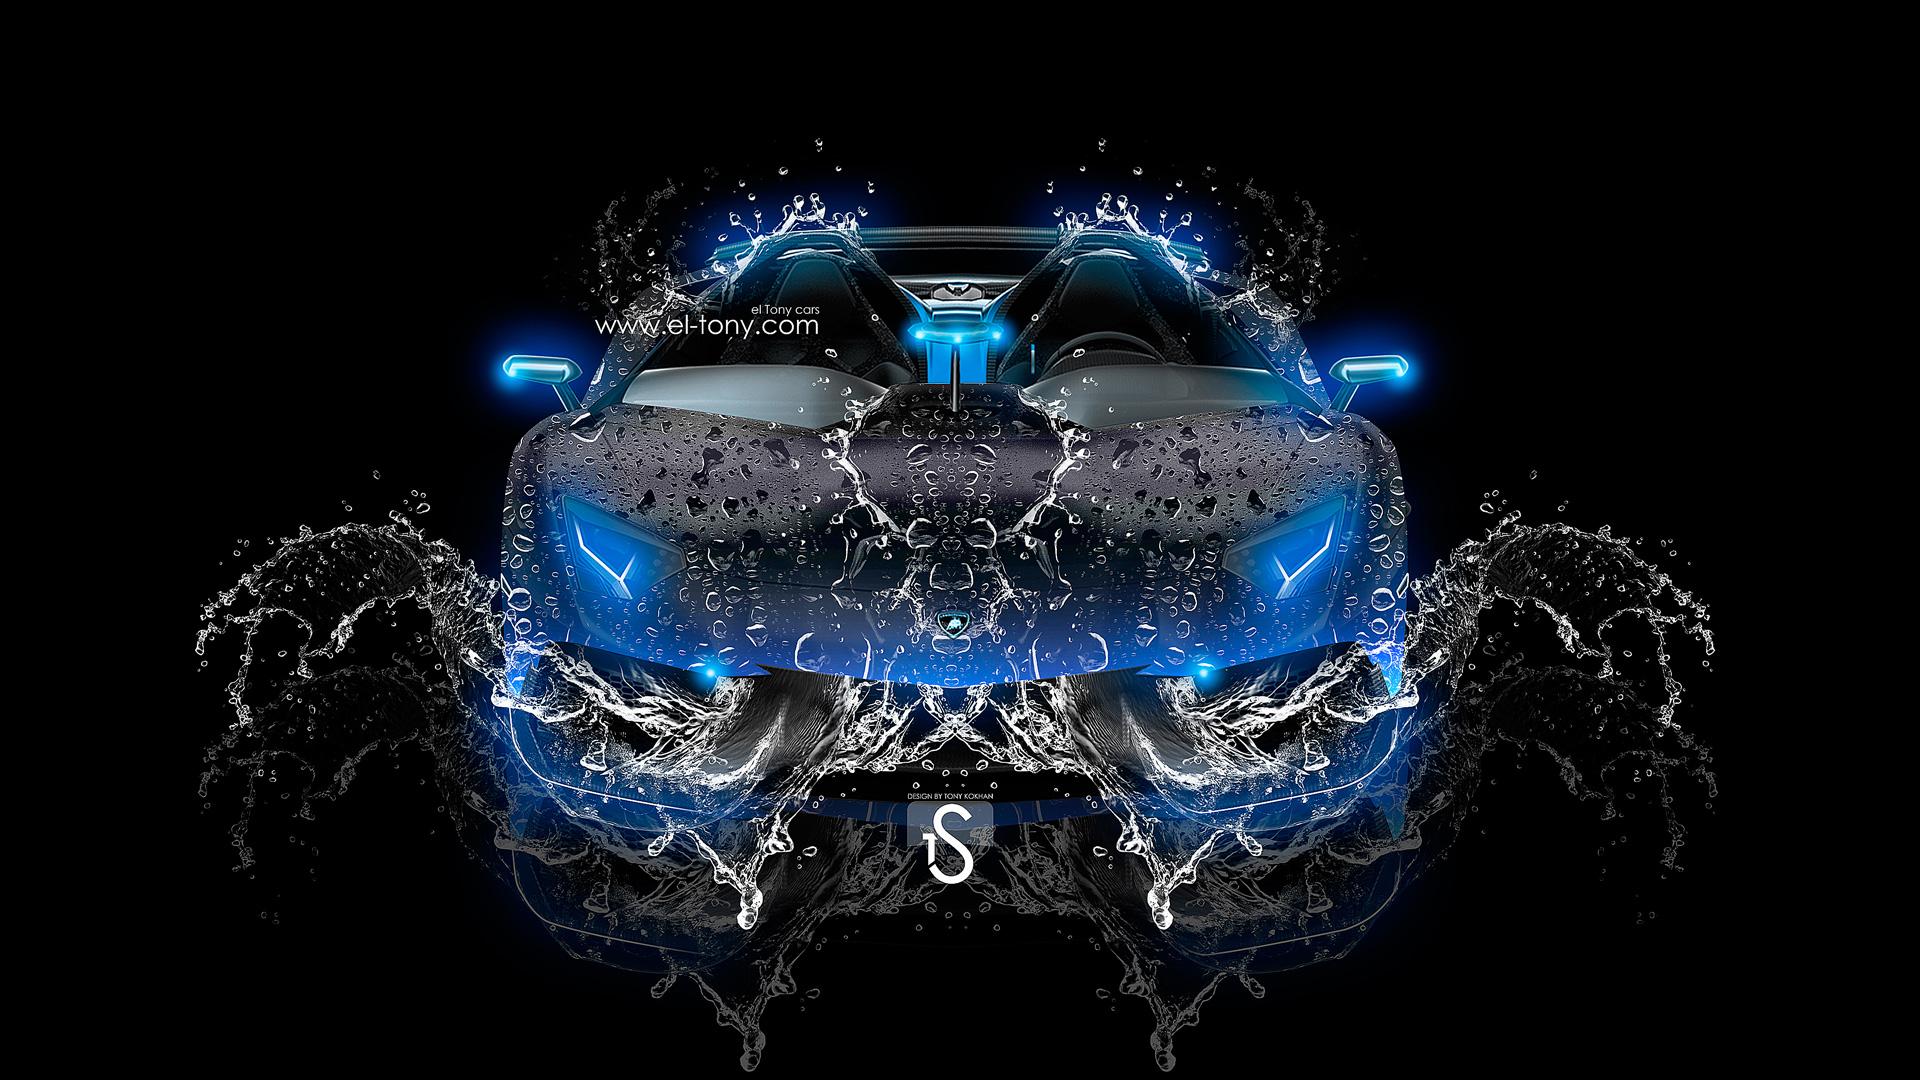 Car 2013 Blue Neon HD Wallpapers by Tony Kokhan [wwwel tonycom 1920x1080